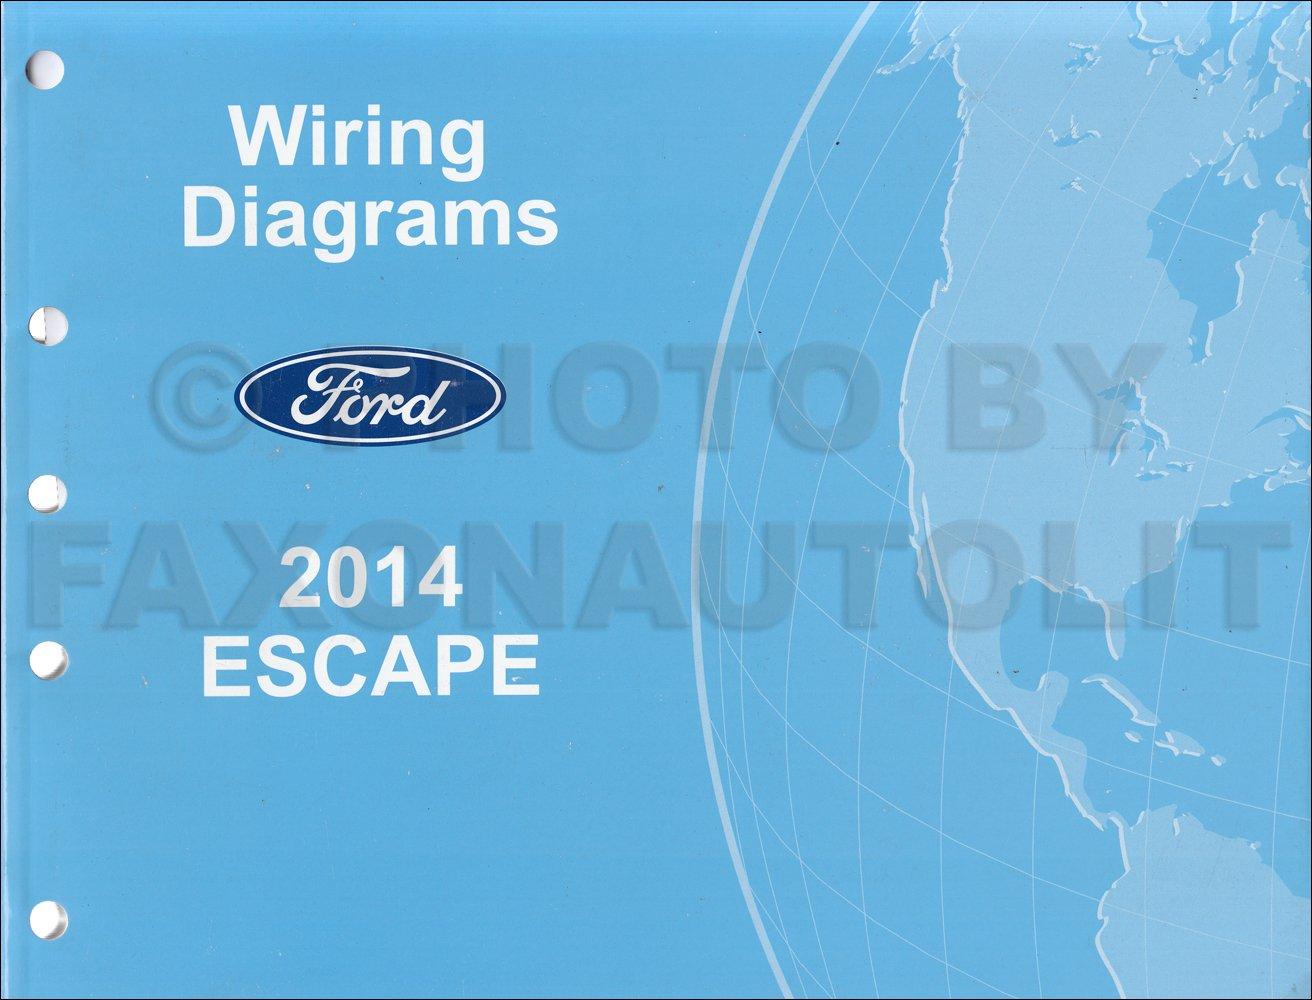 2014 ford escape wiring diagram manual original: ford: amazon.com ... 2014 ford escape wiring diagram 2017 ford escape fuse box diagram amazon.com